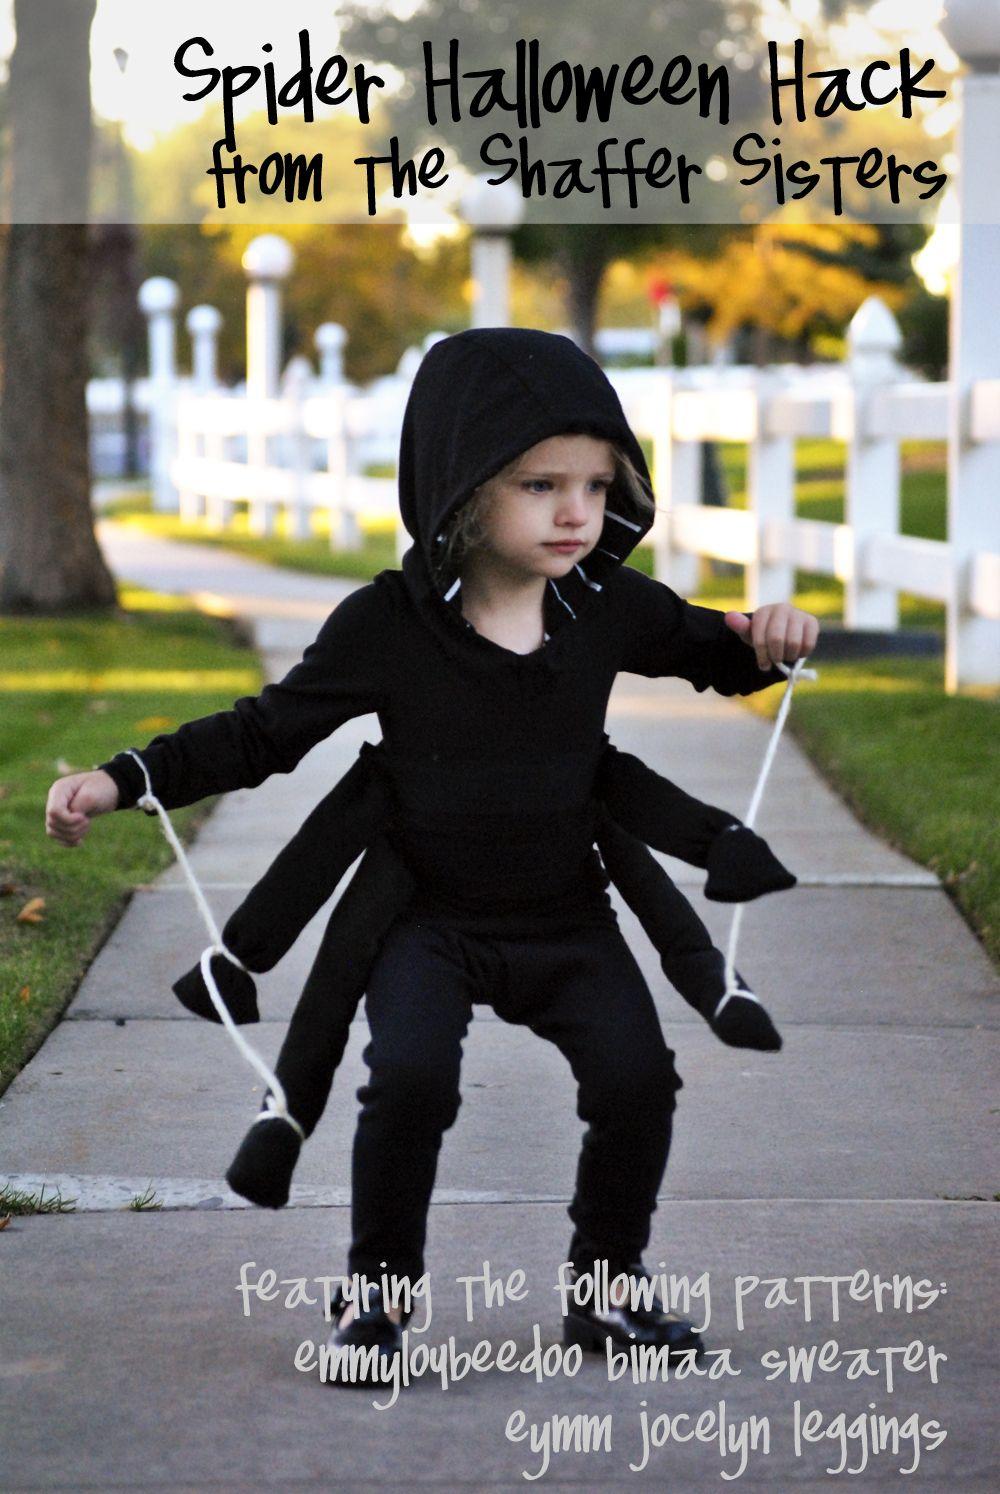 Halloween Verkleidung Kinder Genial Shaffer Sisters Spider Costume Speedy Gonzales Halloween